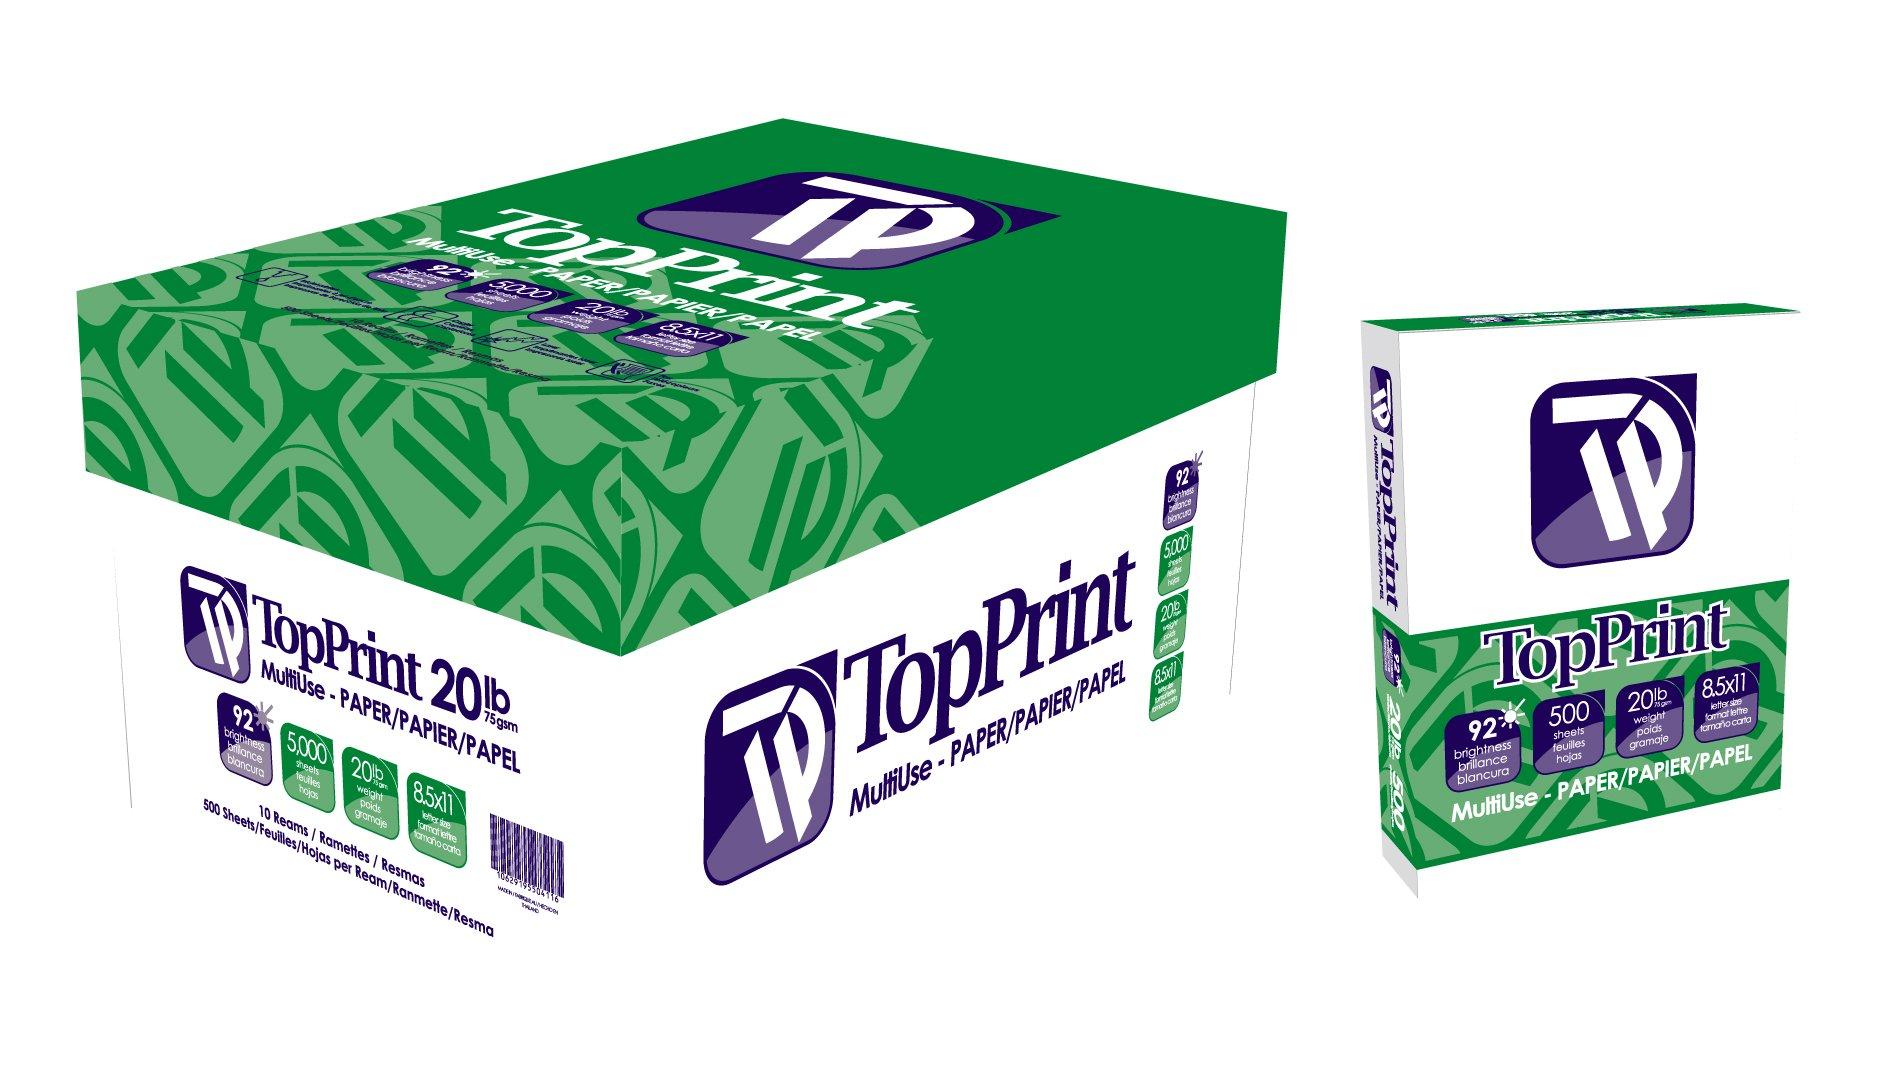 Top Print 92 Bright Premium Copy Paper in Bulk (4+ Cases)